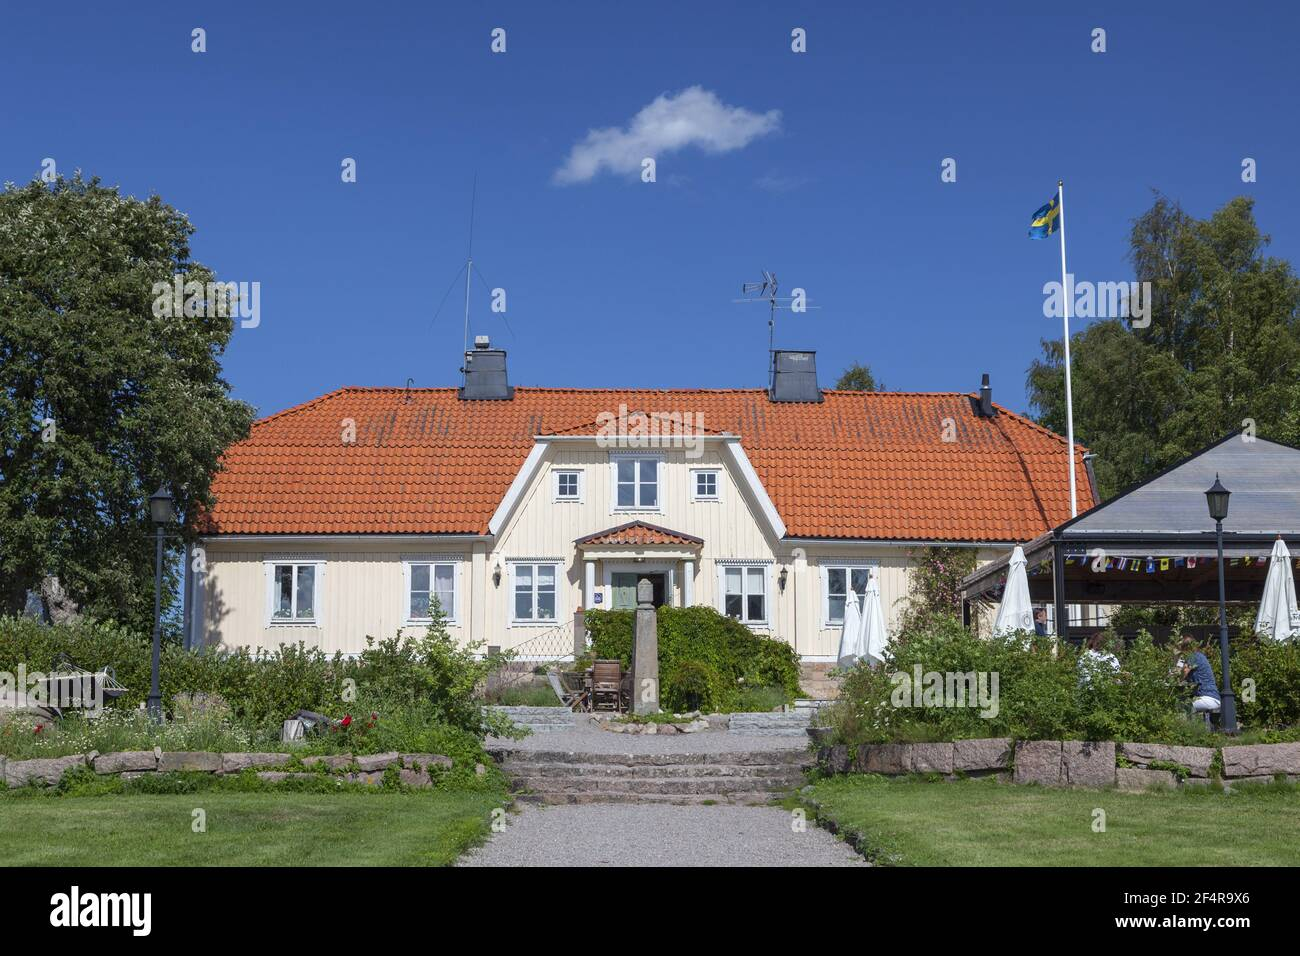 geography / travel, Sweden, Stockholm laen, Stockholm skaergård, former estate now Lidoe Krog on the i, Additional-Rights-Clearance-Info-Not-Available Stock Photo